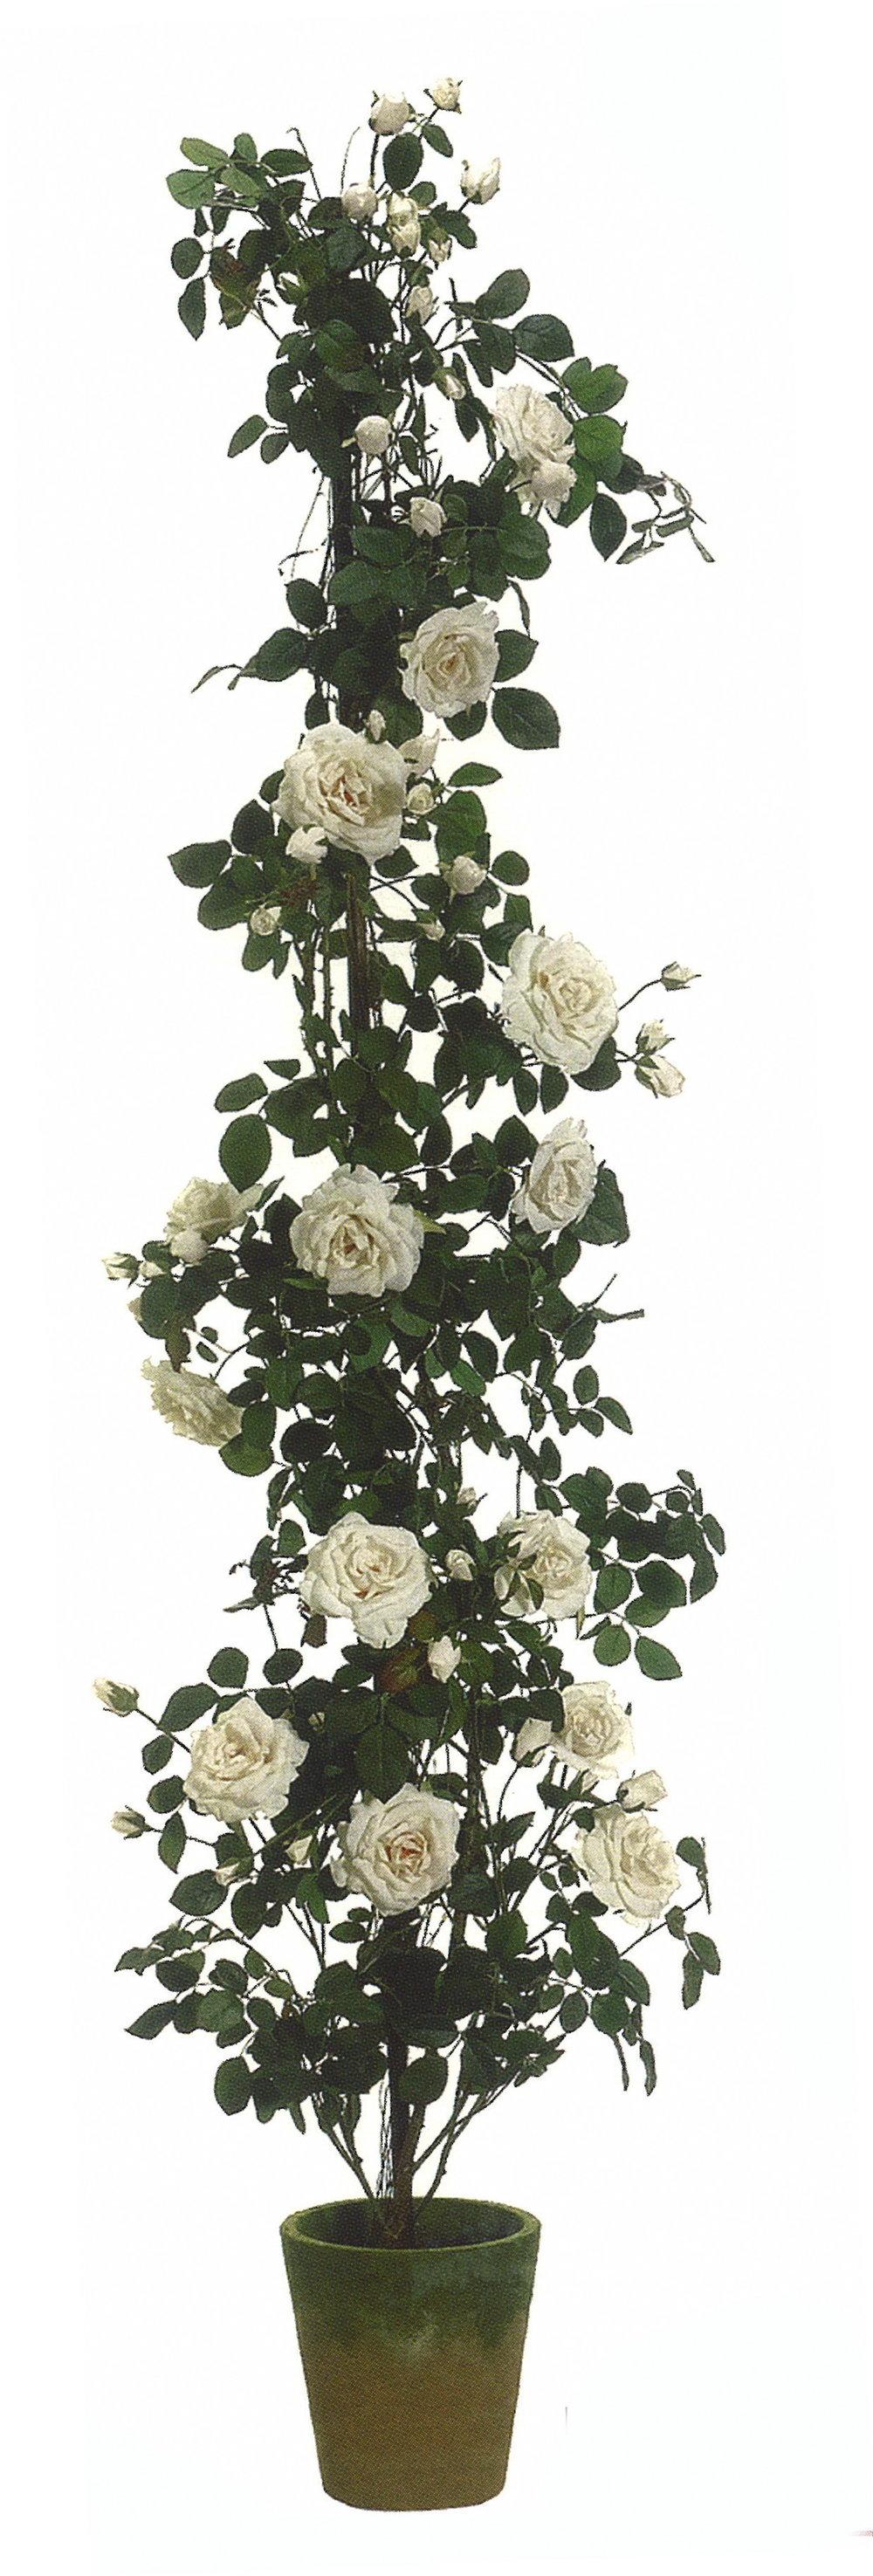 TSP 3121- Climbing Rose tree